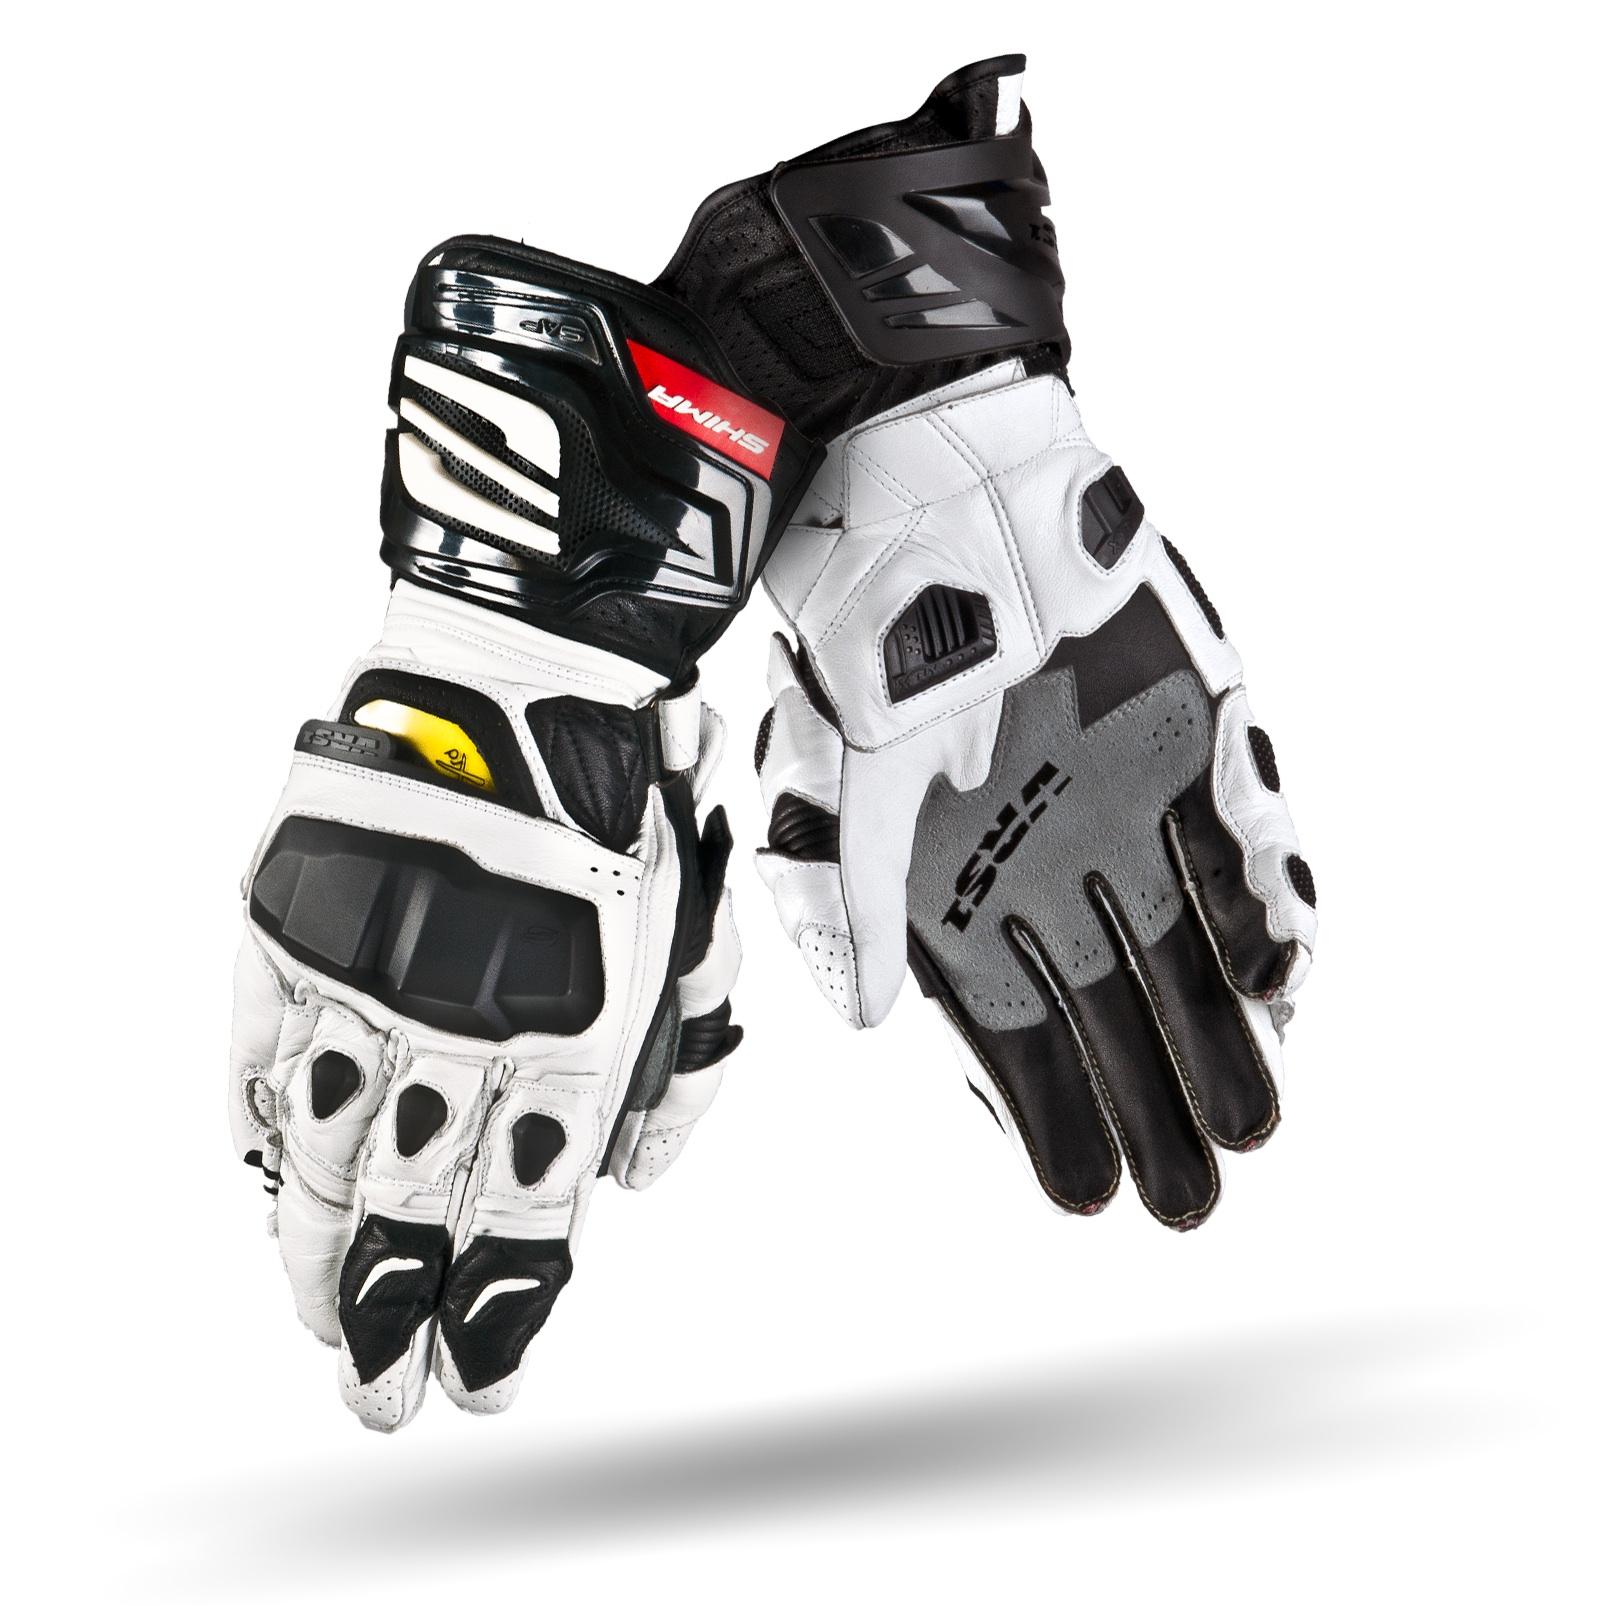 Rękawice motocyklowe VRS, prod. Shima.